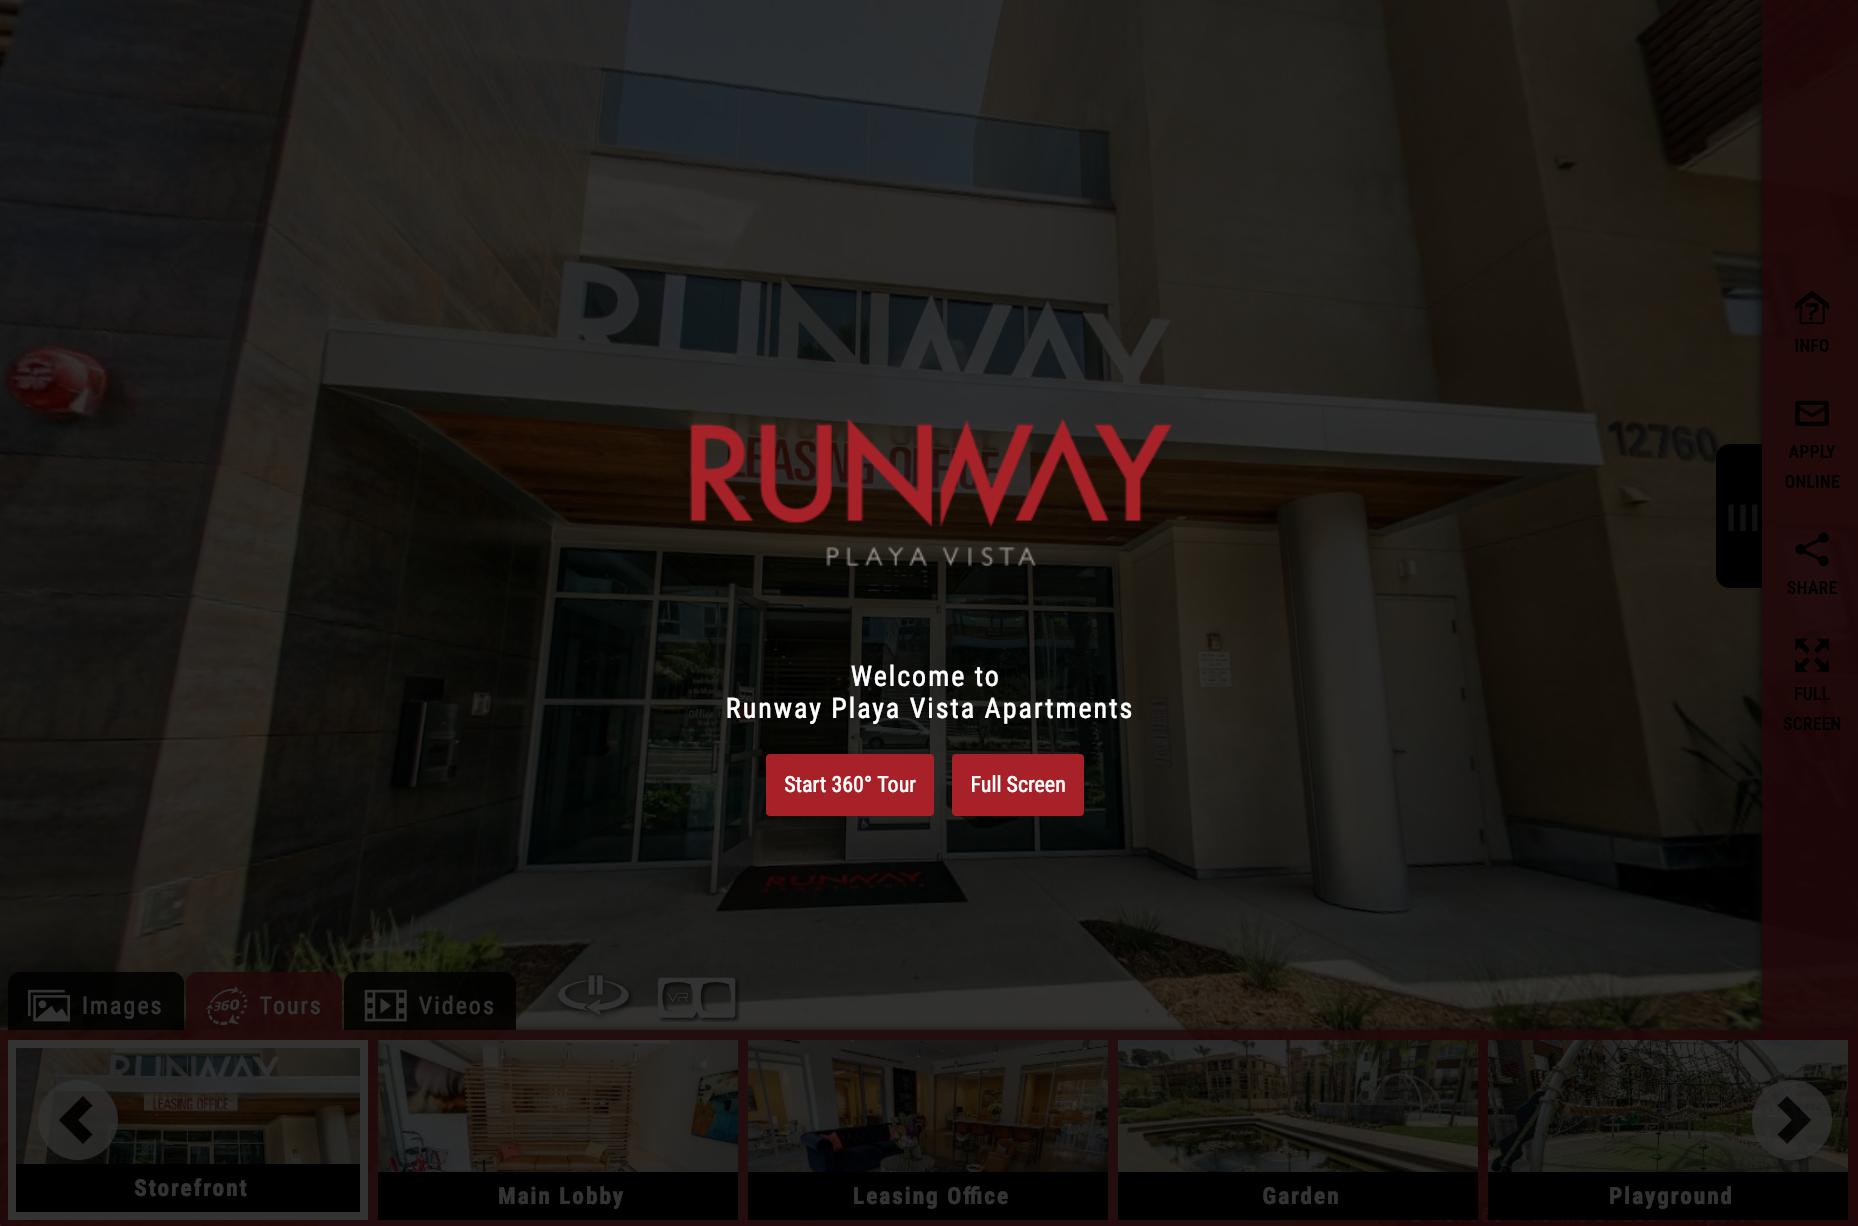 Runway.png